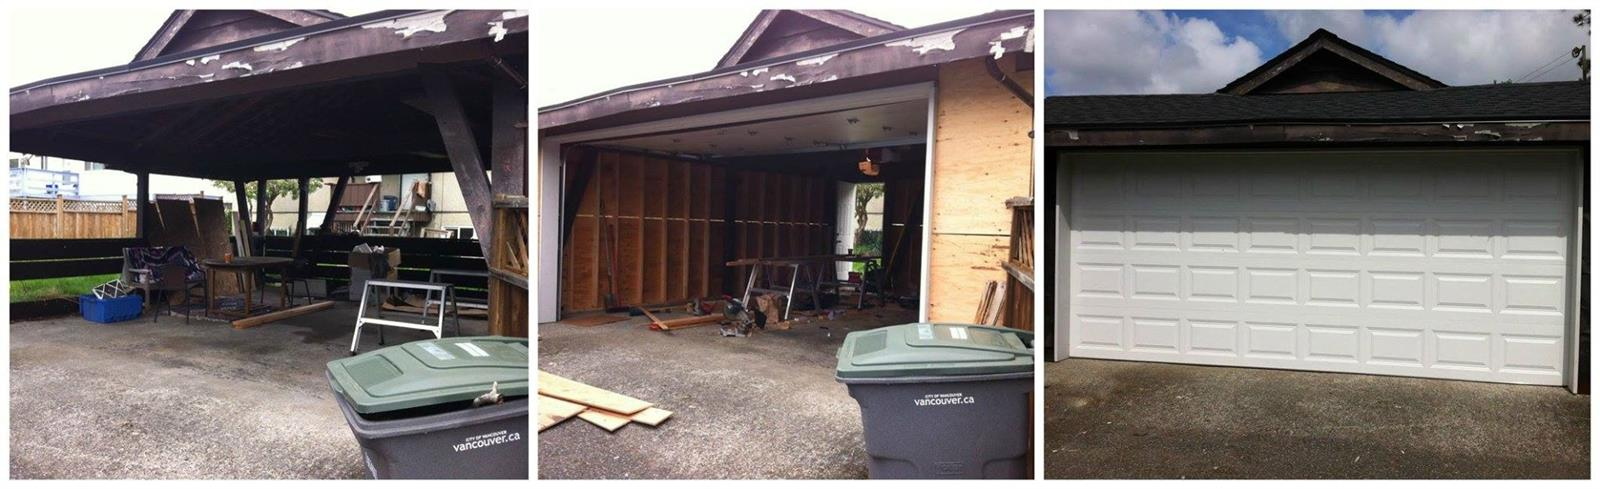 Convert Carport Into Garage